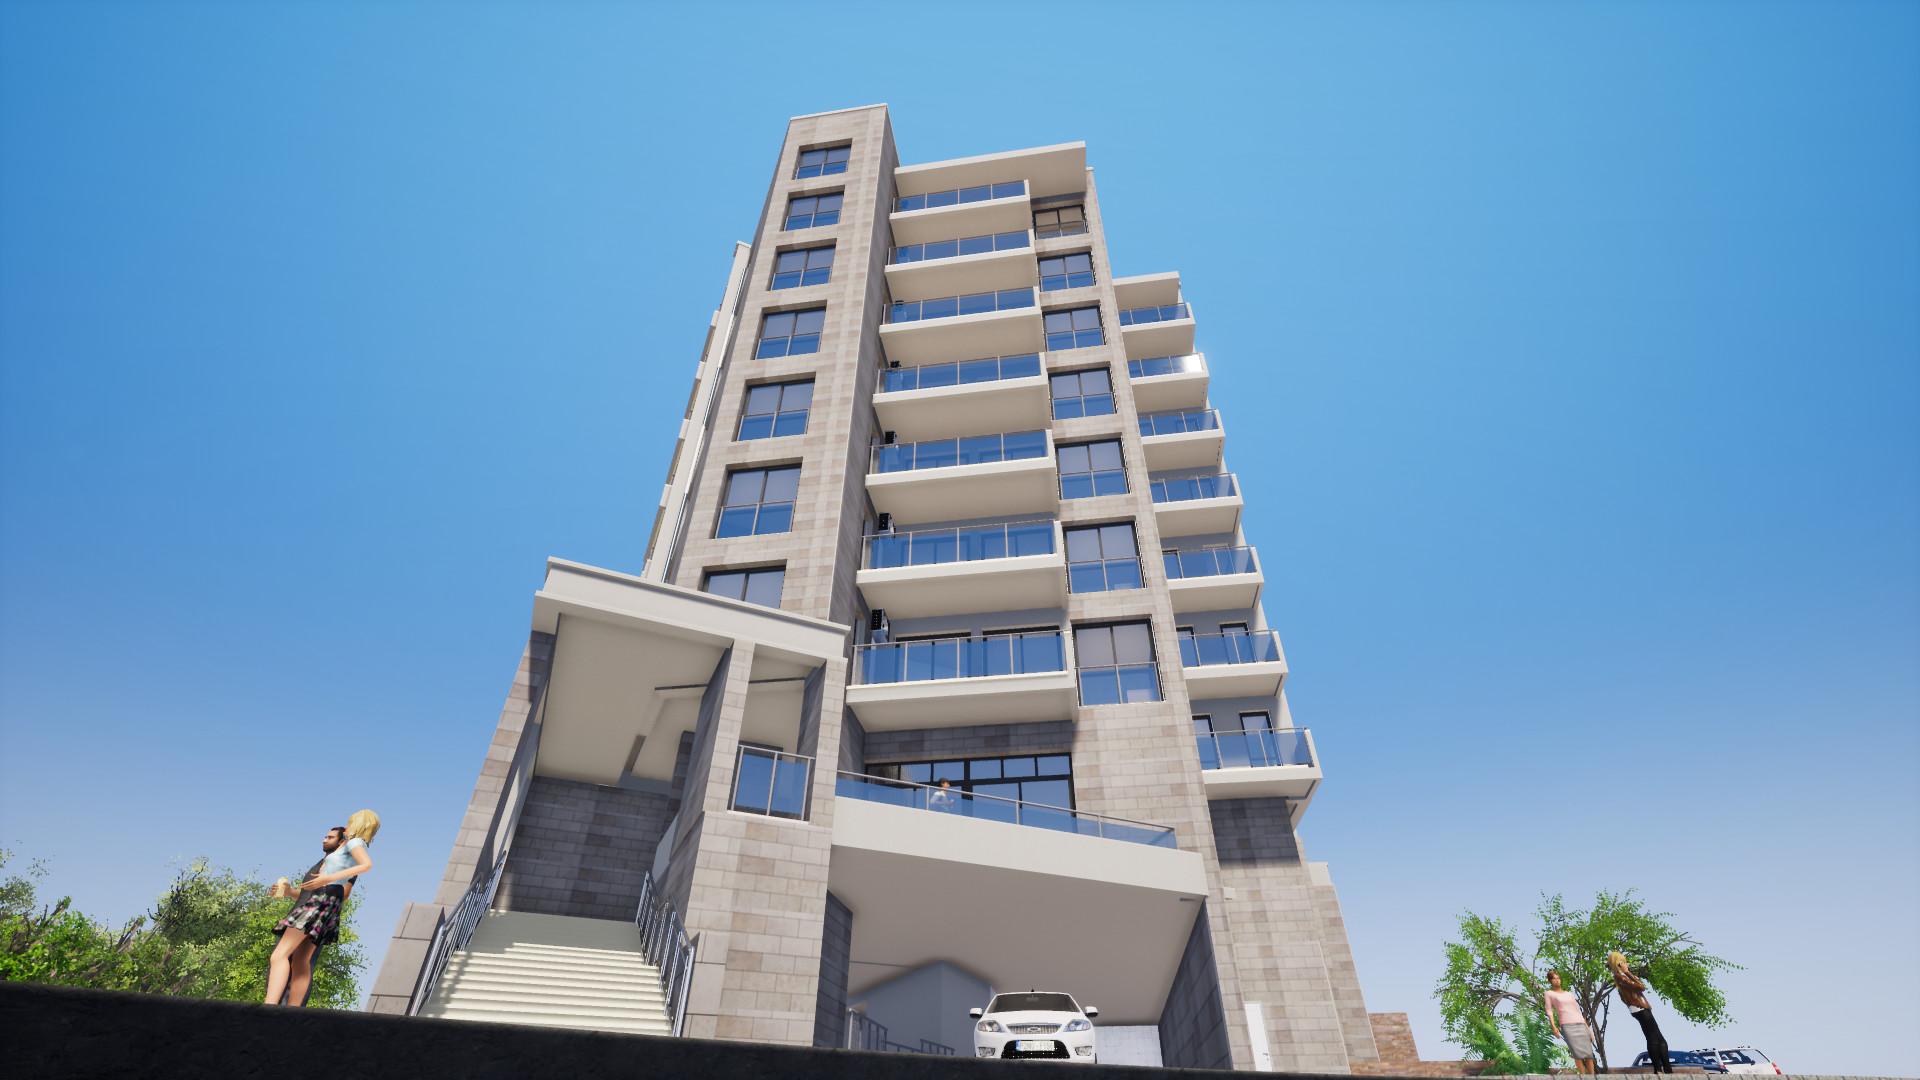 Projekt:<b>                                             Apartmanski objekat - Bečiči                                             </b>